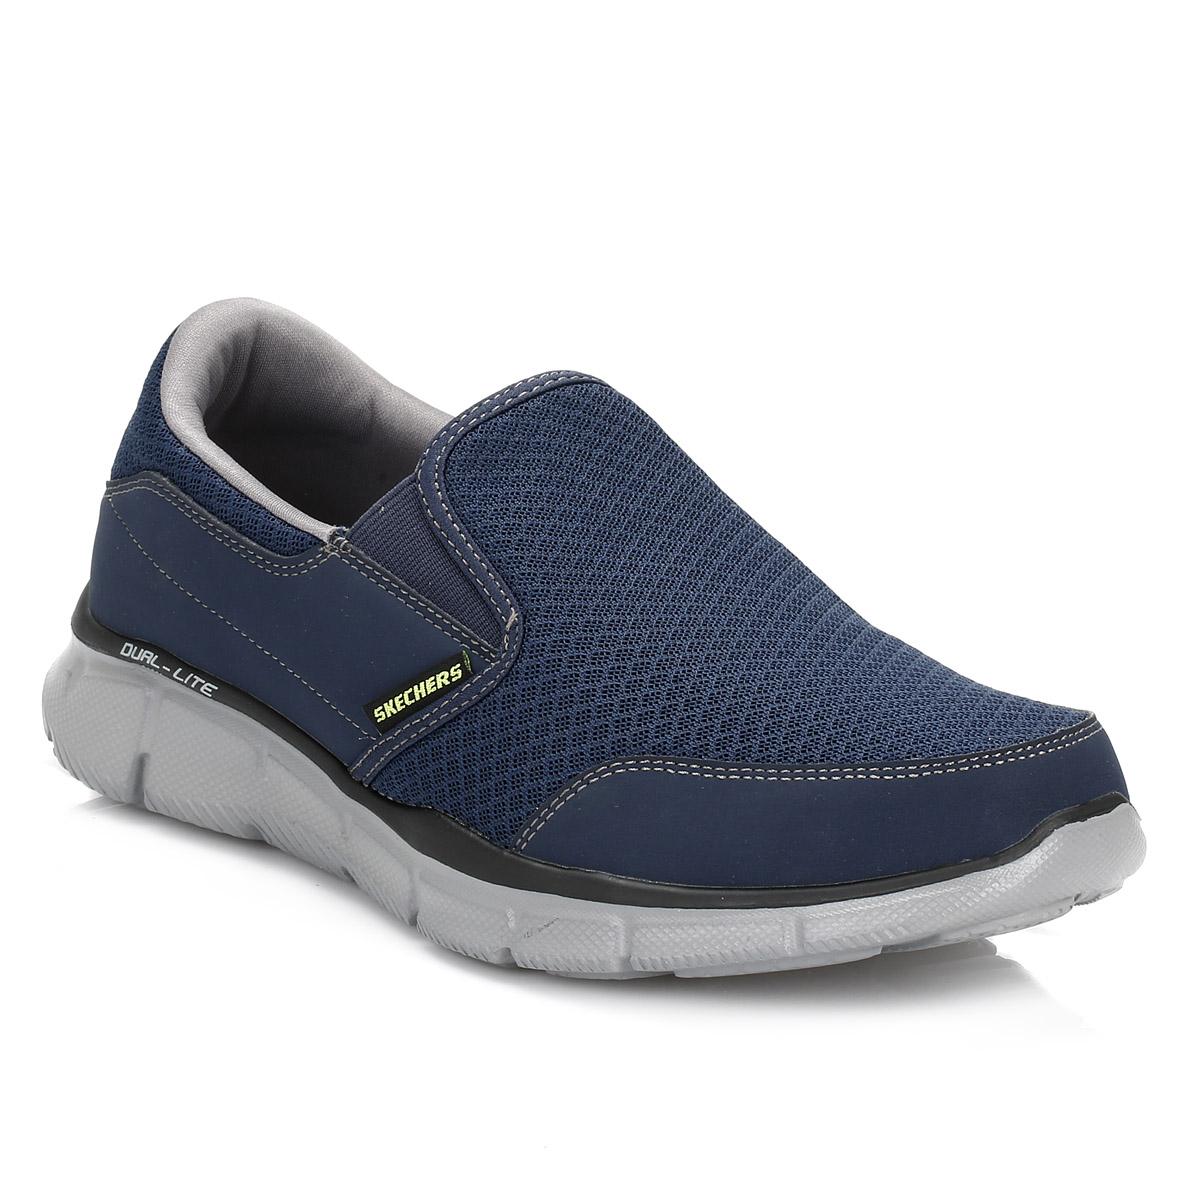 skechers mens navy grey persistent equalizer trainers dual lite sport shoes ebay. Black Bedroom Furniture Sets. Home Design Ideas